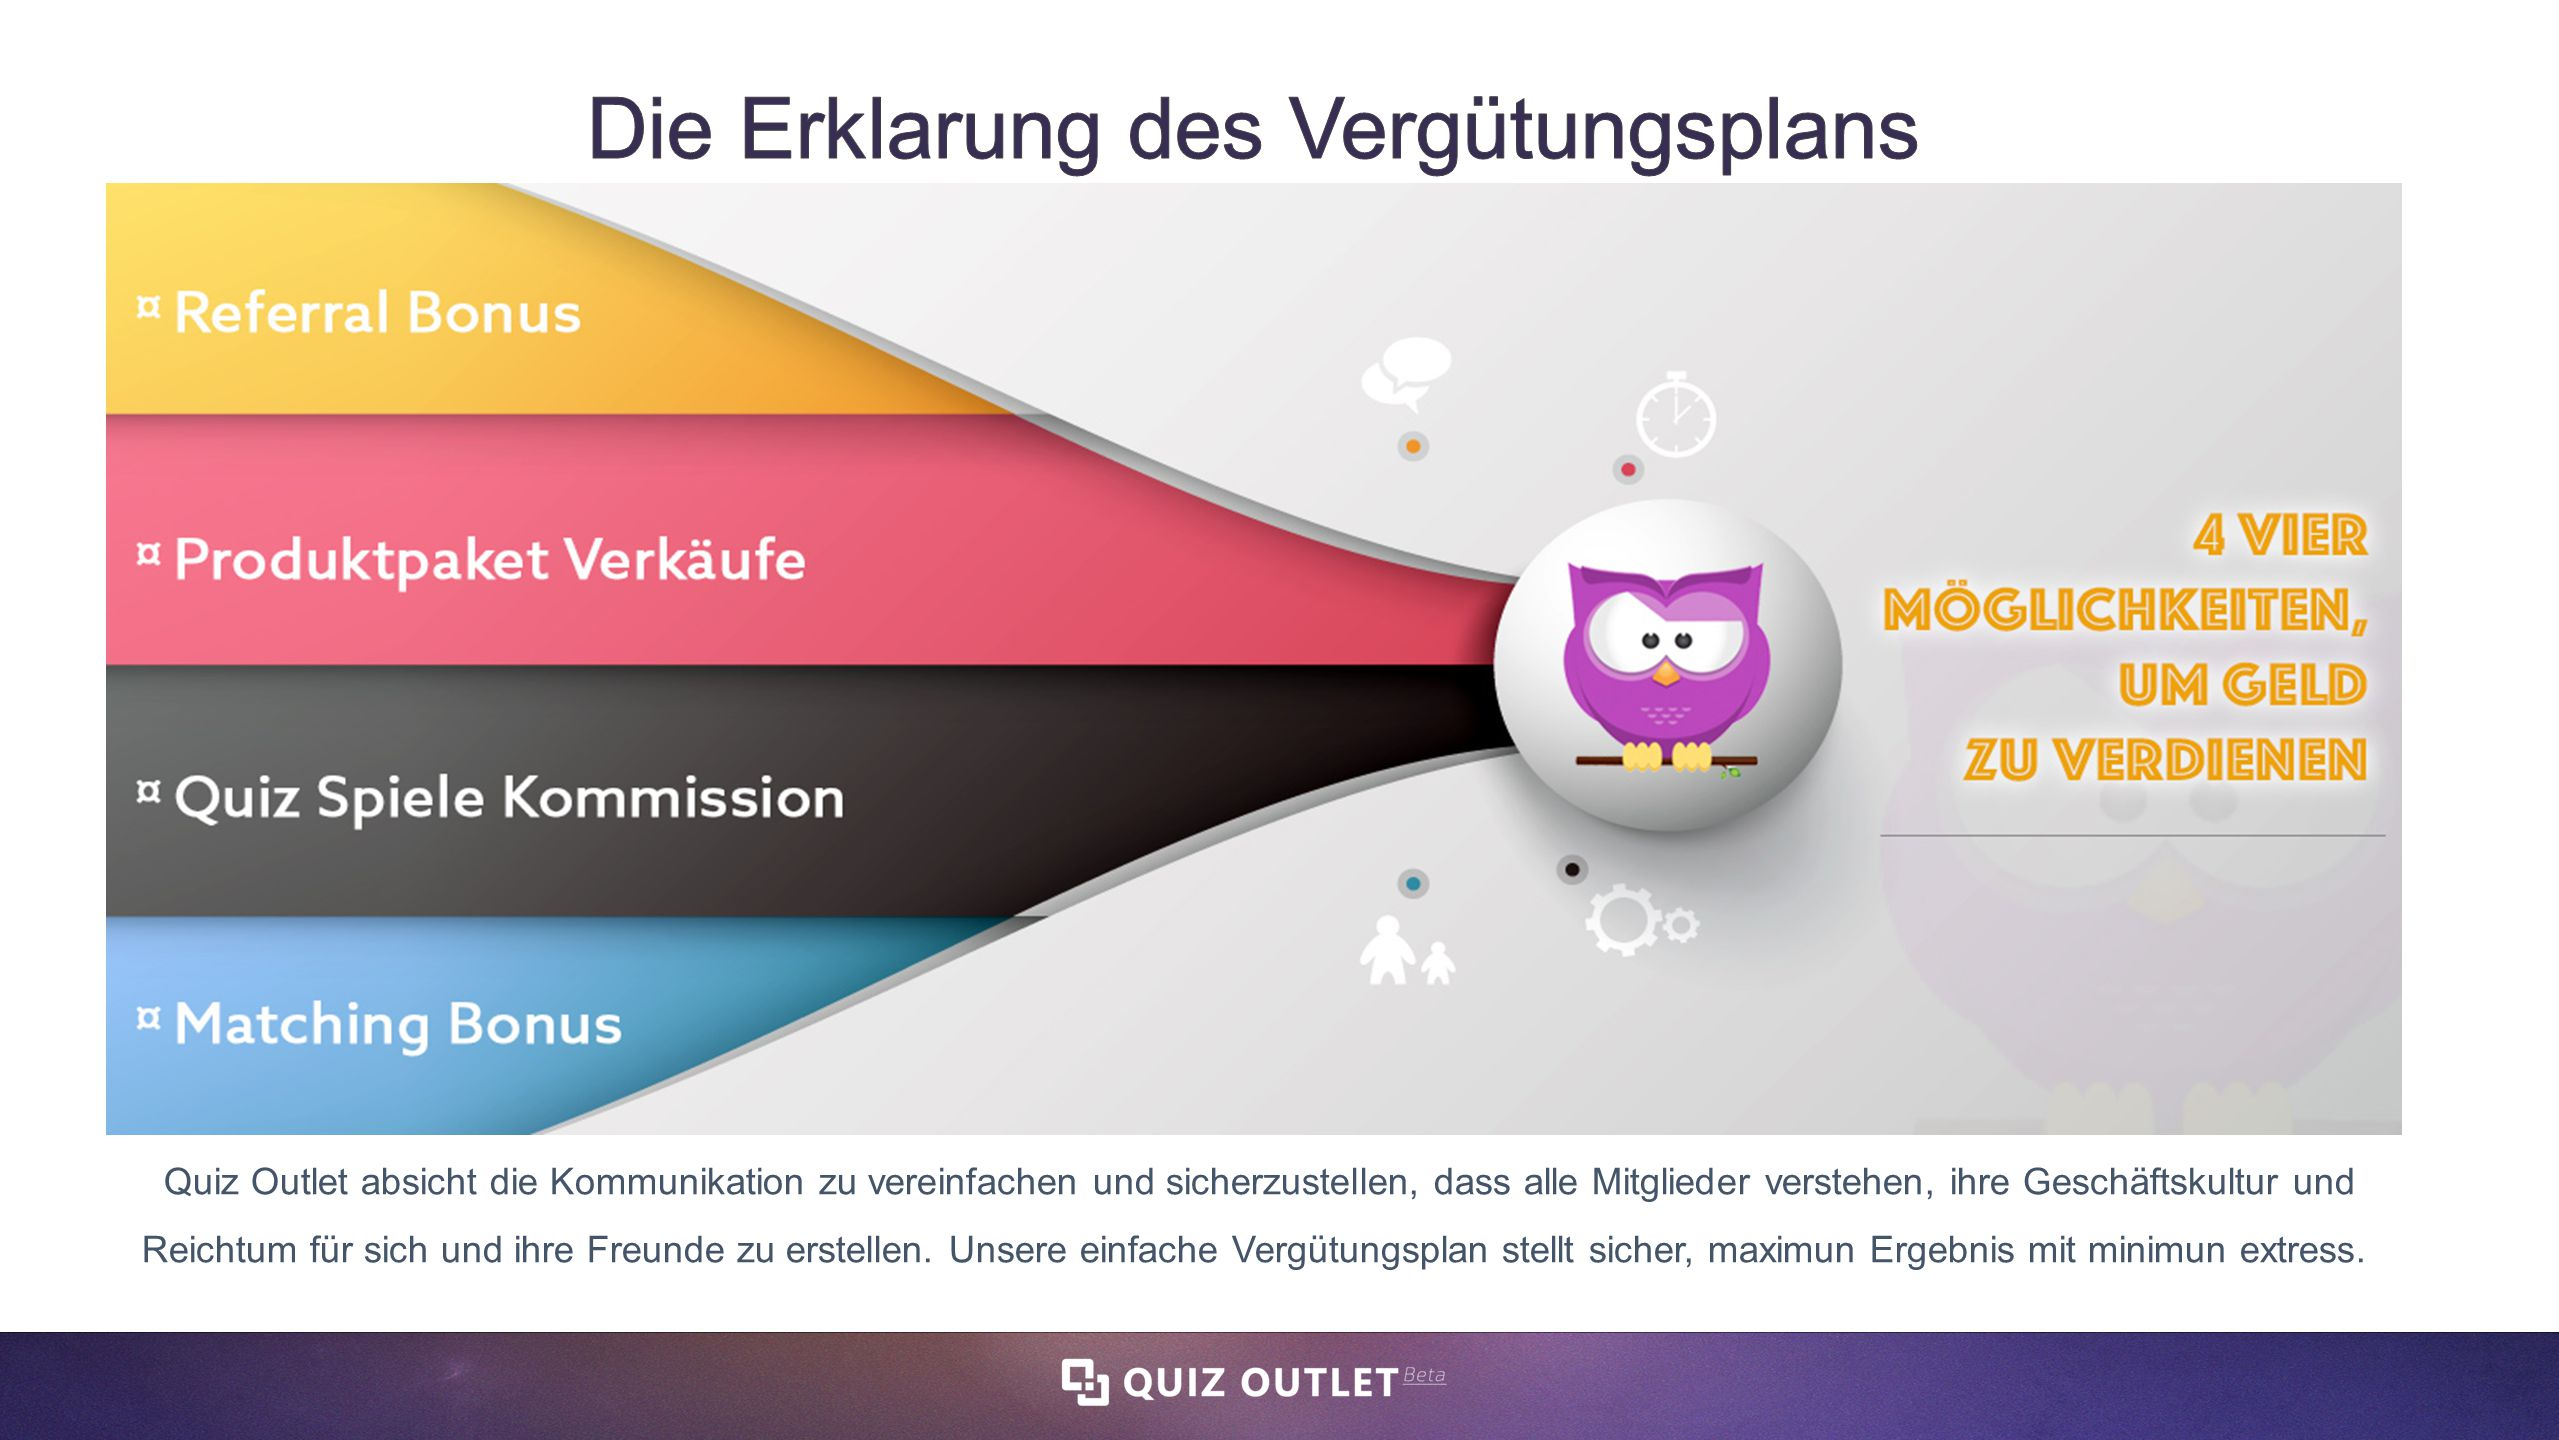 www.companyname.com © 2016 Jetfabrik Multipurpose Theme.